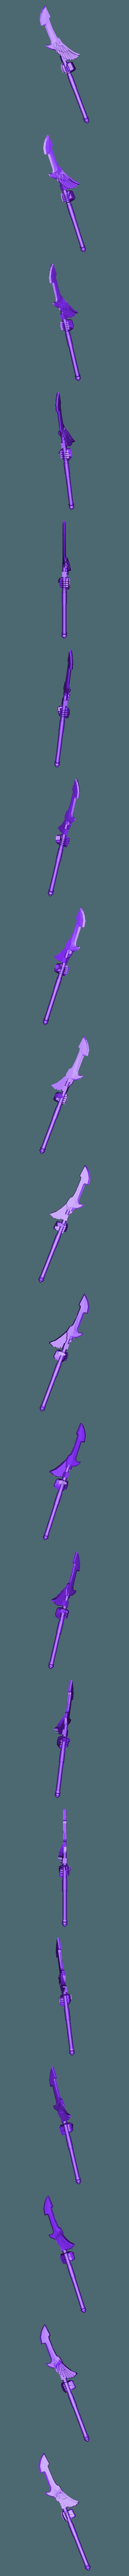 Spear_Left_hand_repaired.stl Download free STL file 1000 Followers! 3rd Legion - FireBird Terminators • 3D printing model, ThatEvilOne